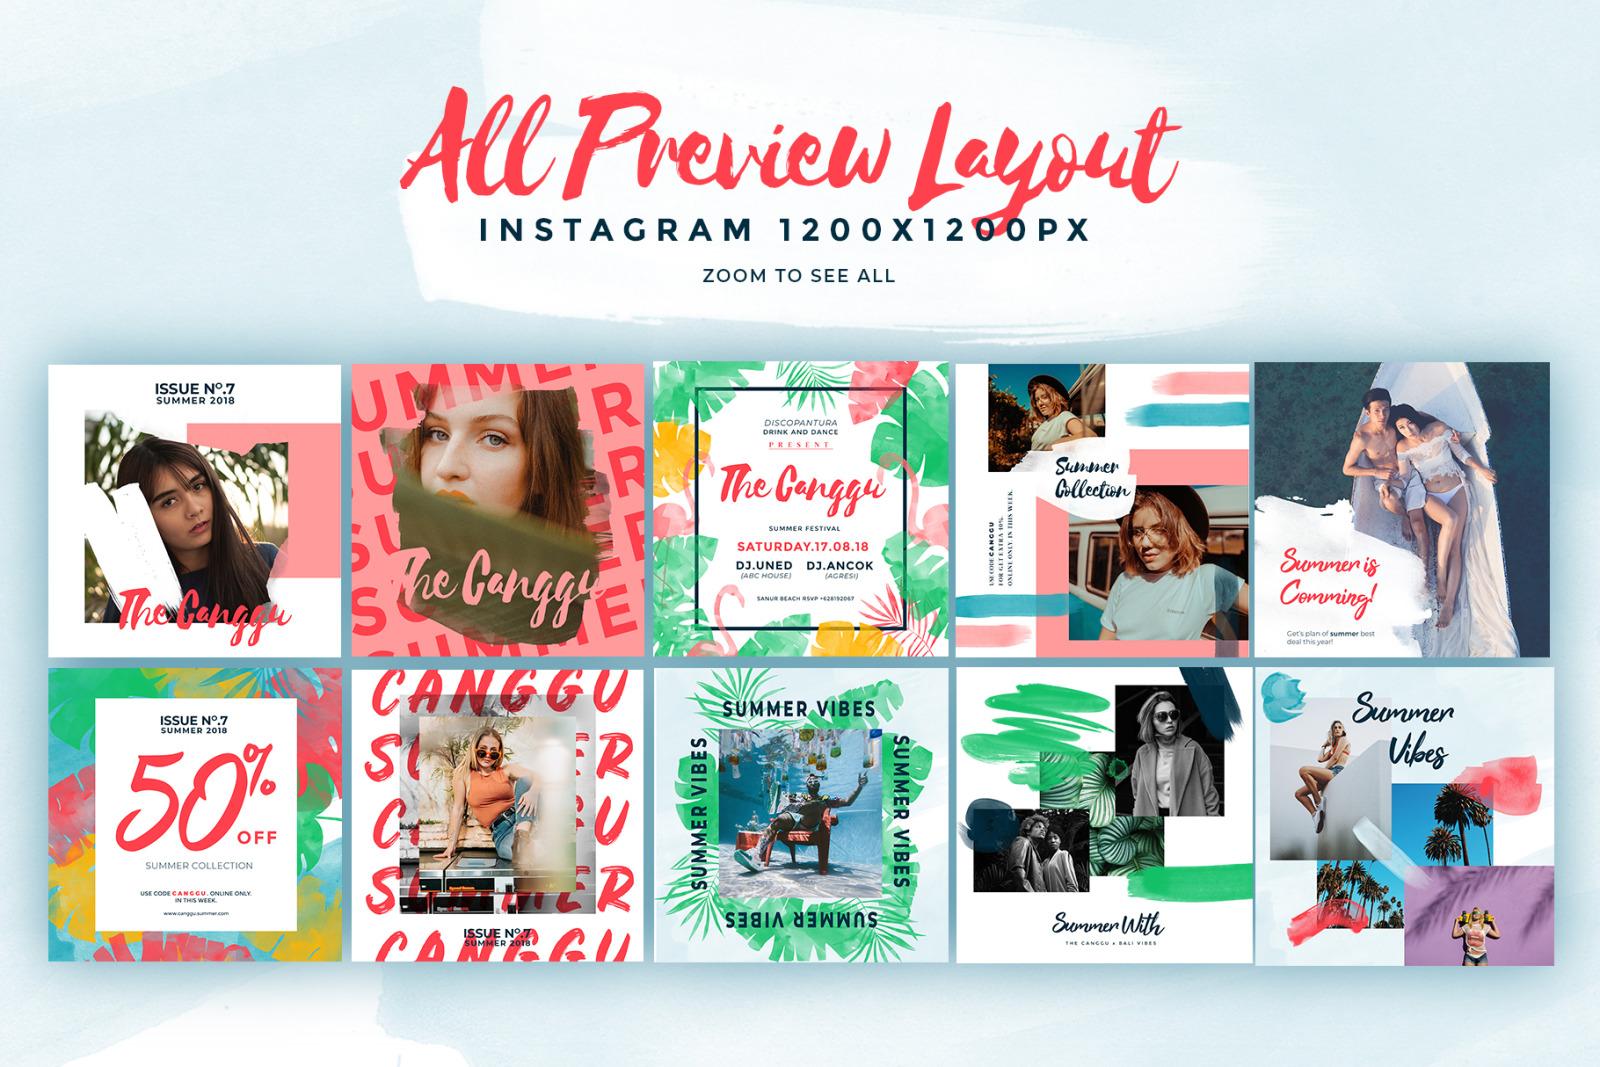 CANGGU-Social Media Pack Templates